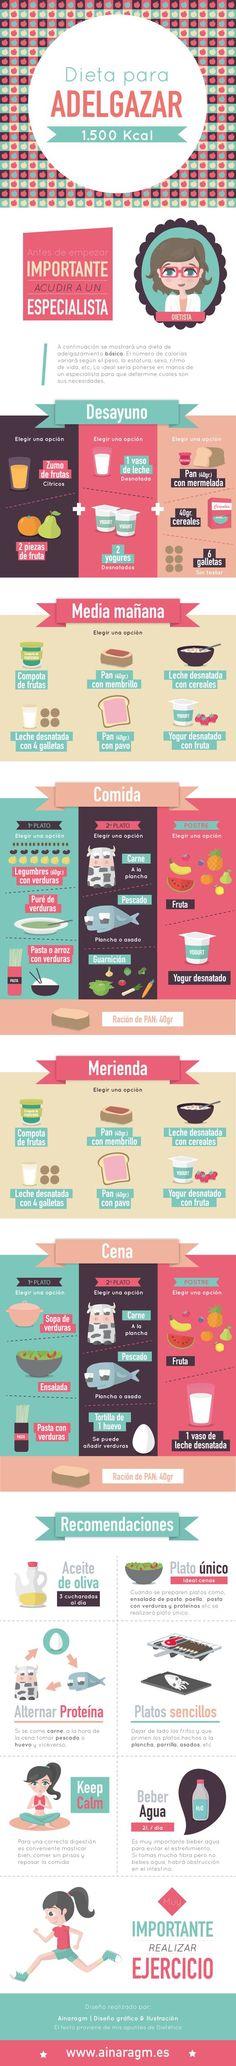 #Infografia sobre una dieta de adelgazamiento #adelgazar: